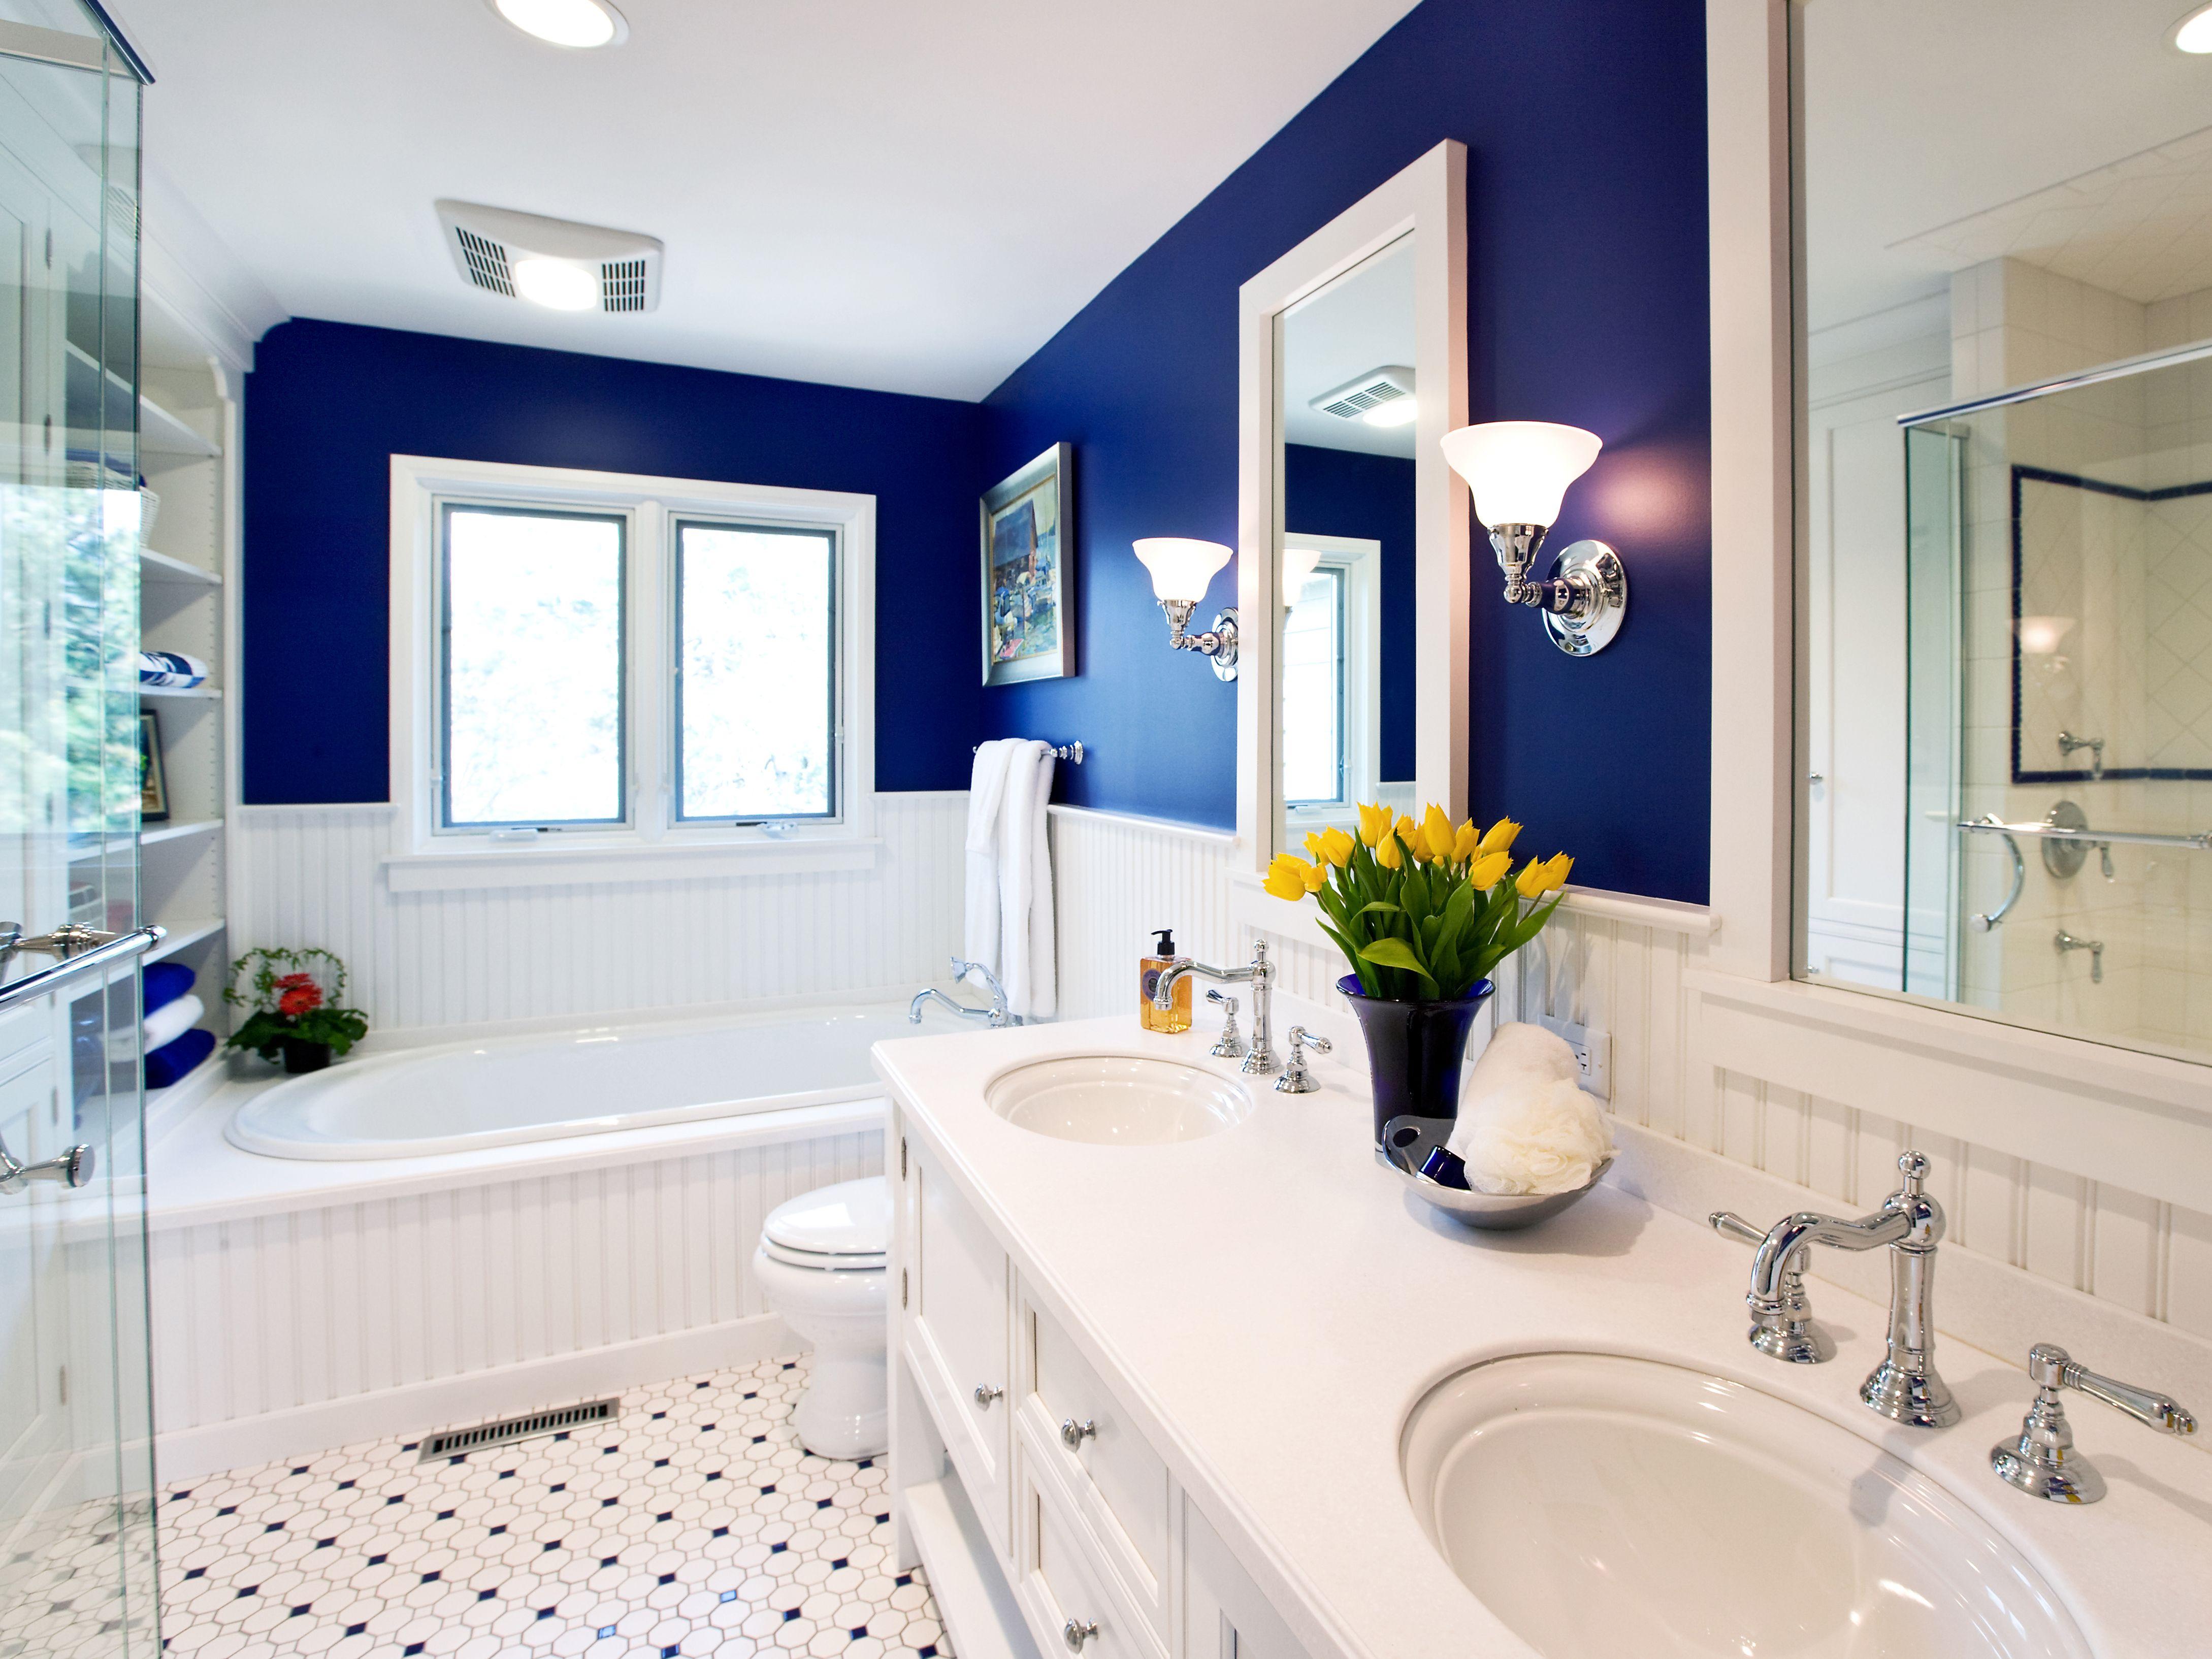 Blue Bathroom Wall Tile Pinterest Spoty Tile Bathroom Floor Drk Blue Color Bathroom Wall Our Yellow Bathrooms Nautical Bathroom Decor Blue Bathroom Decor